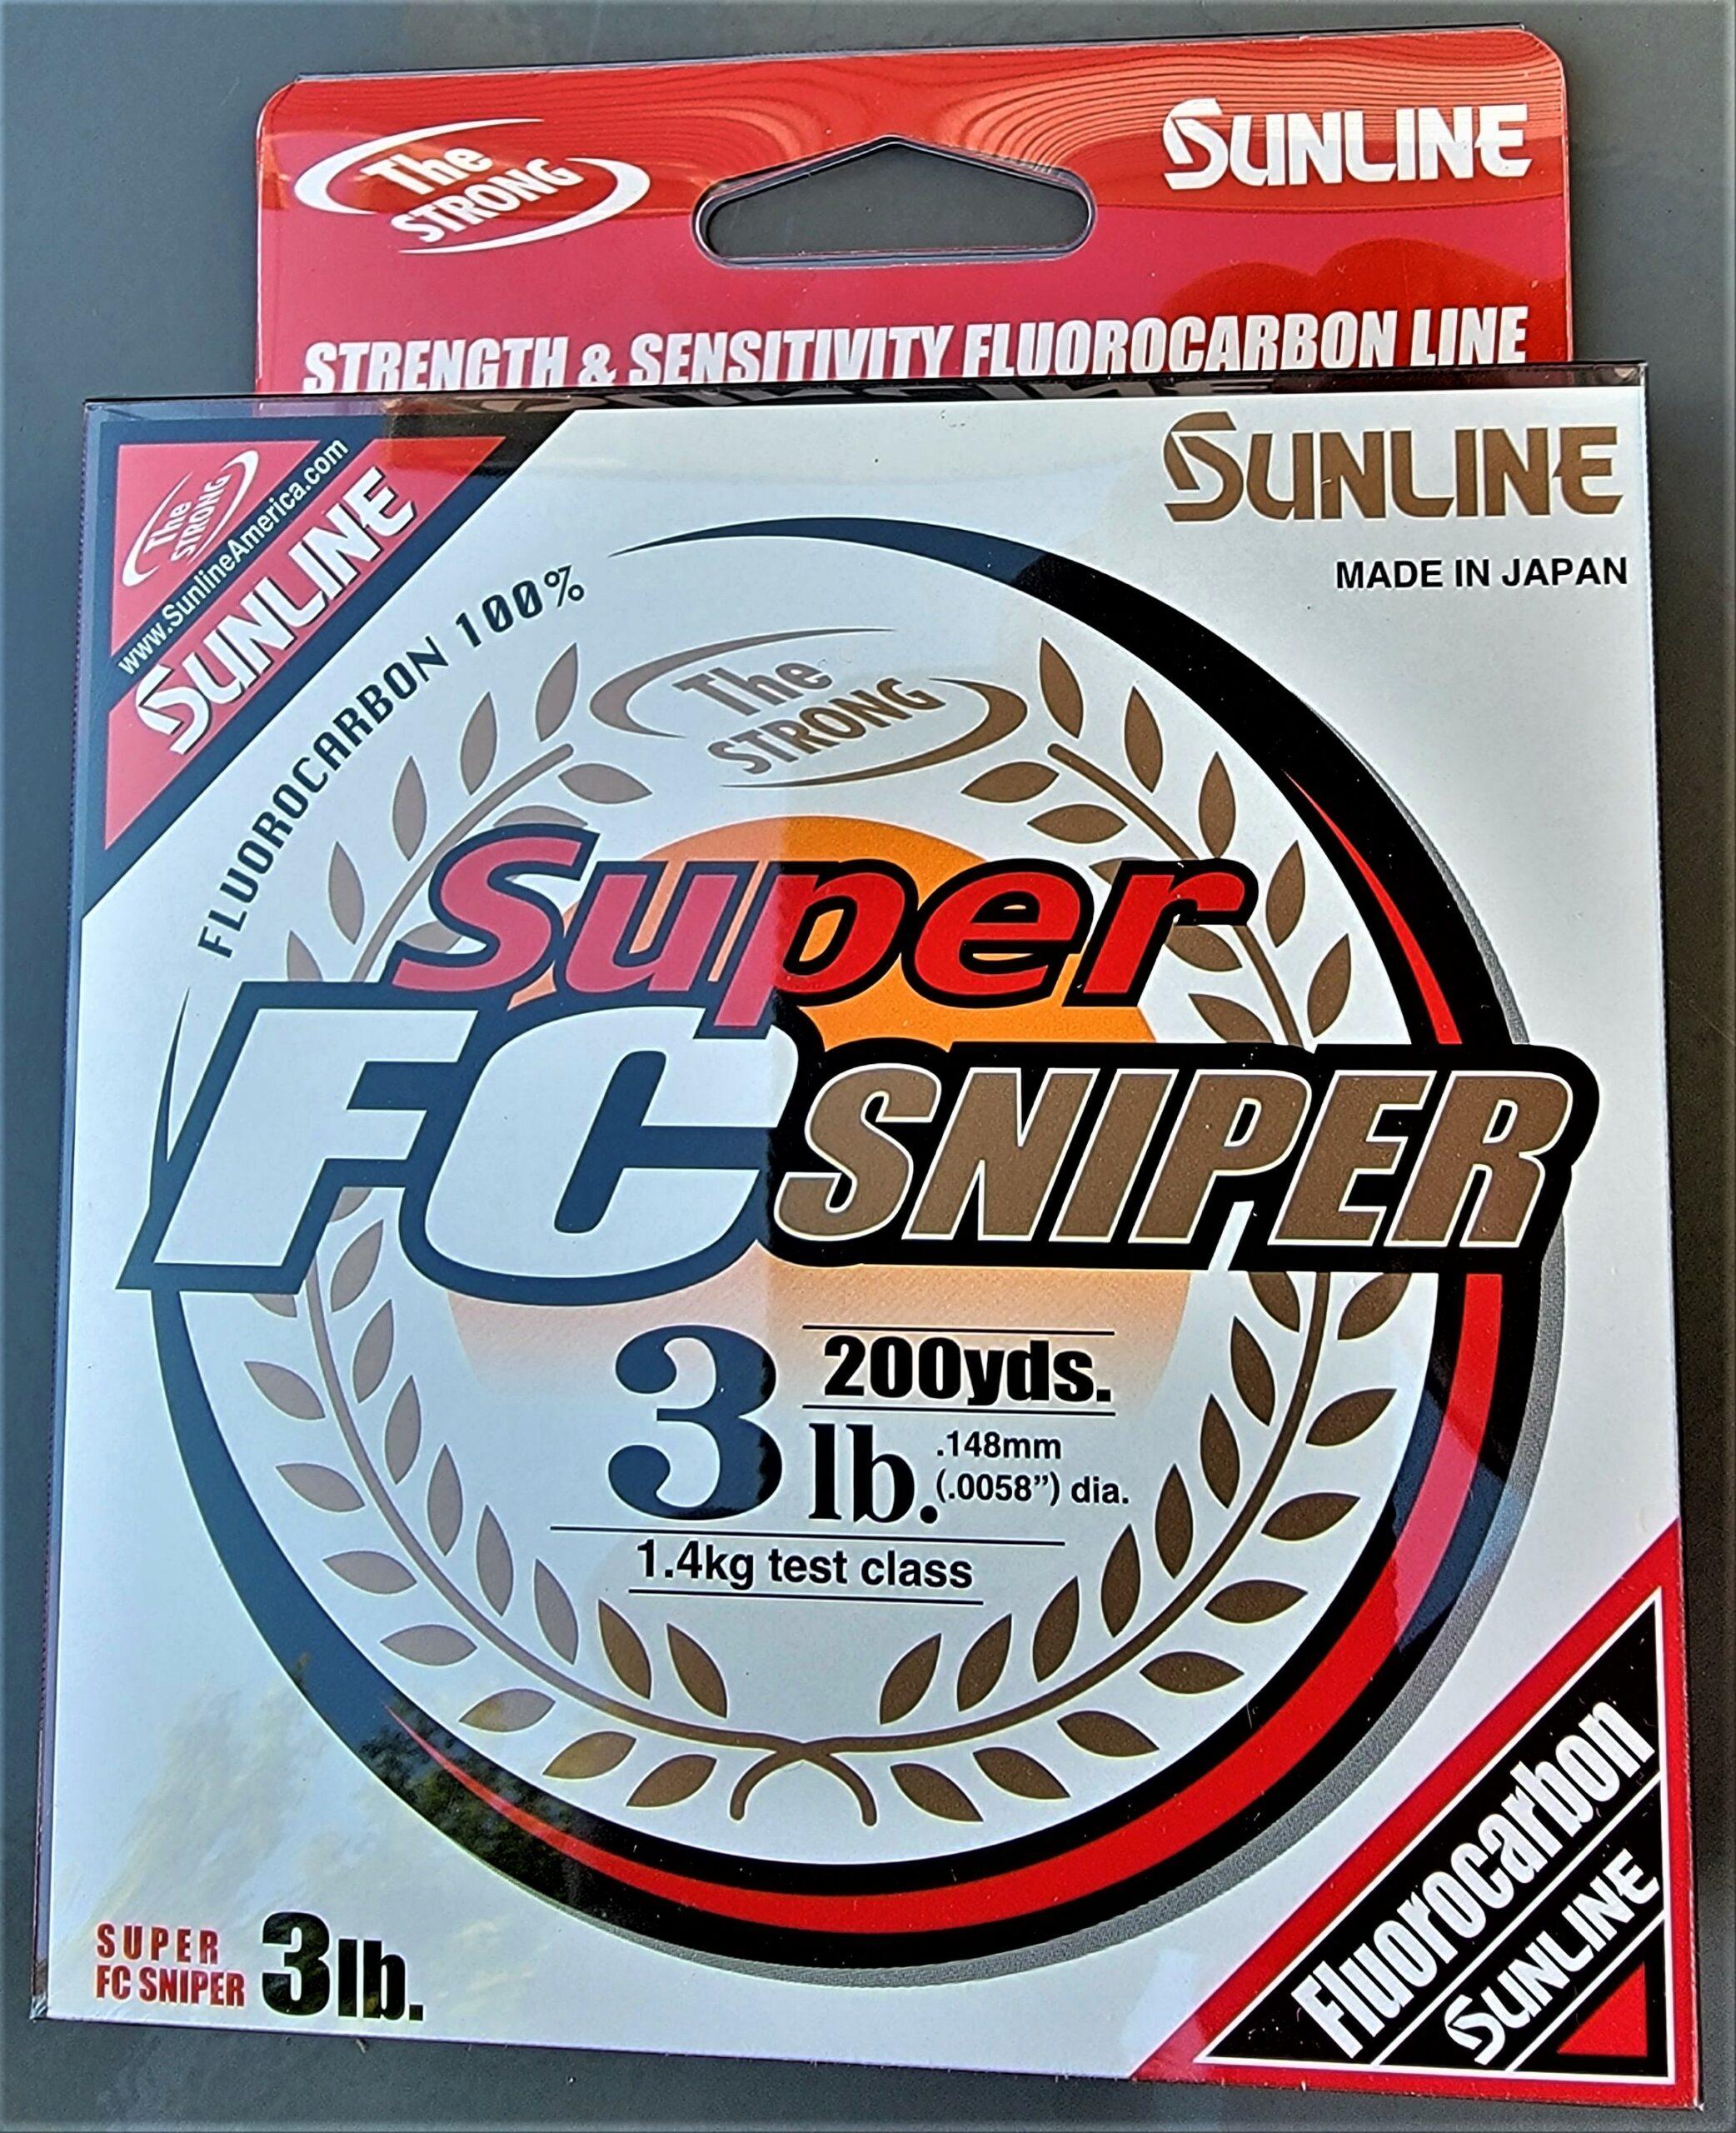 Sunline - Super FC Sniper - 200 YD - Super FC Sniper - 3 LB - Natural Clear